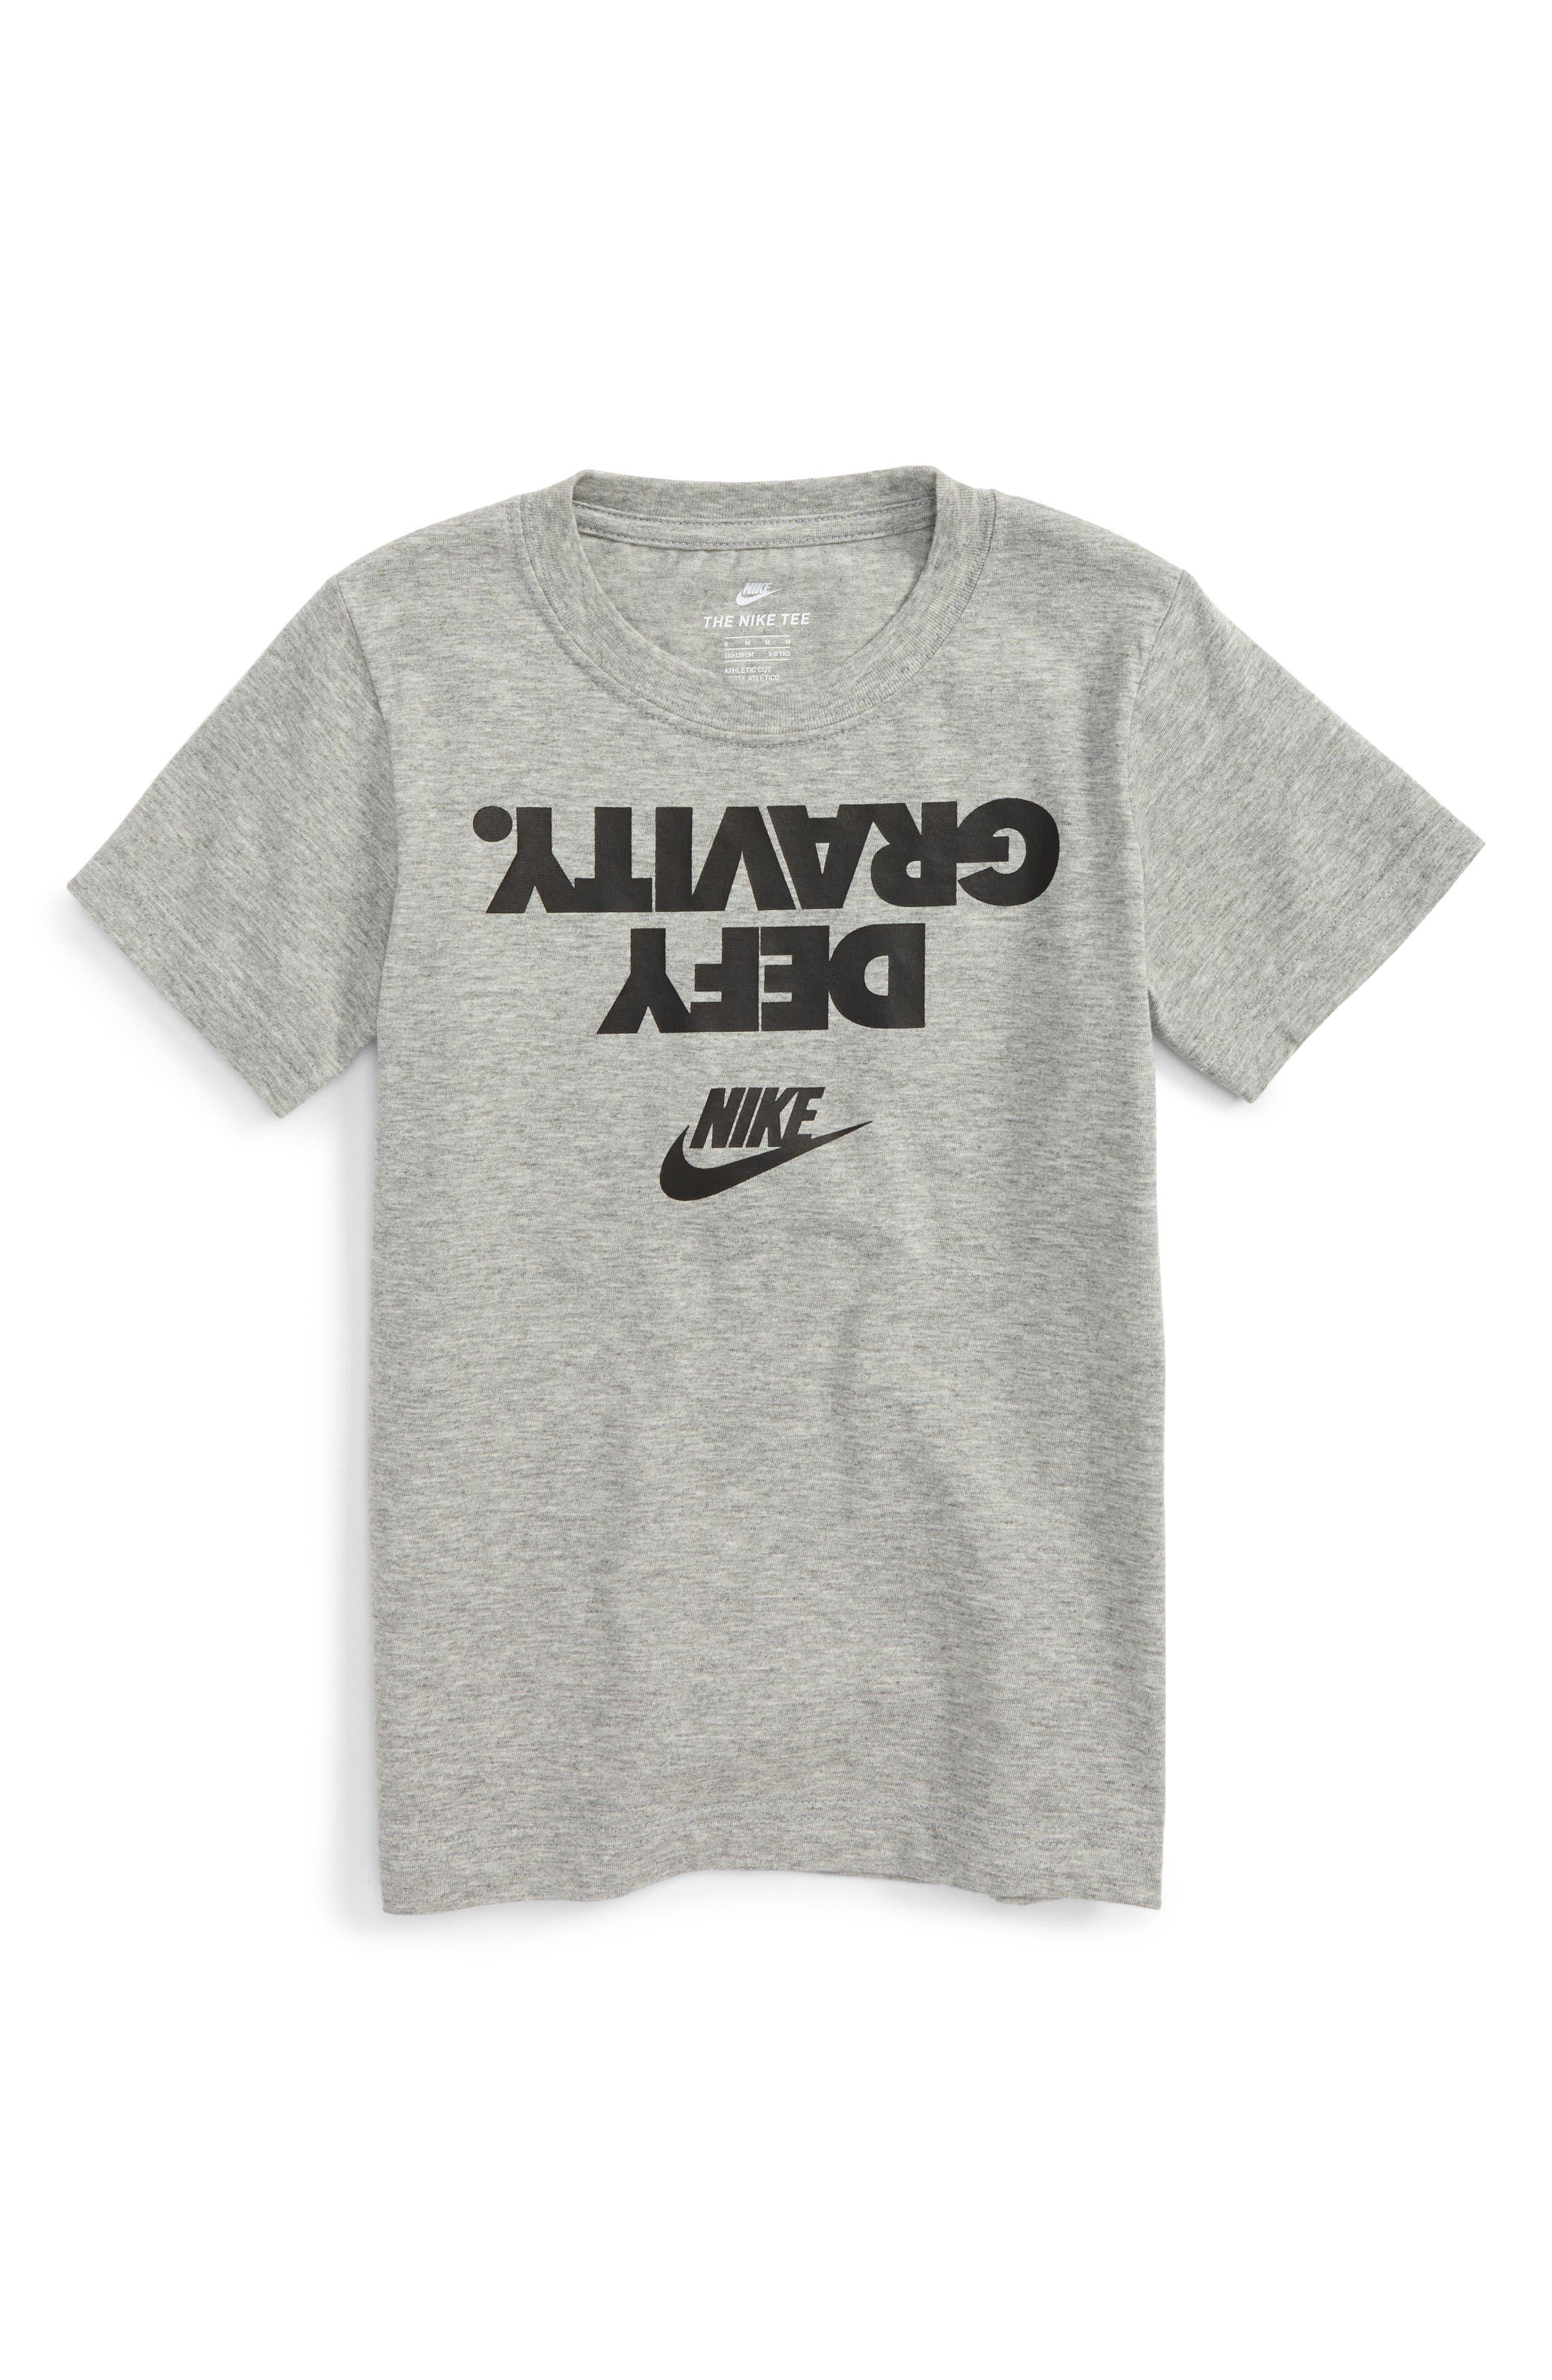 Nike Defy Gravity Graphic T-Shirt